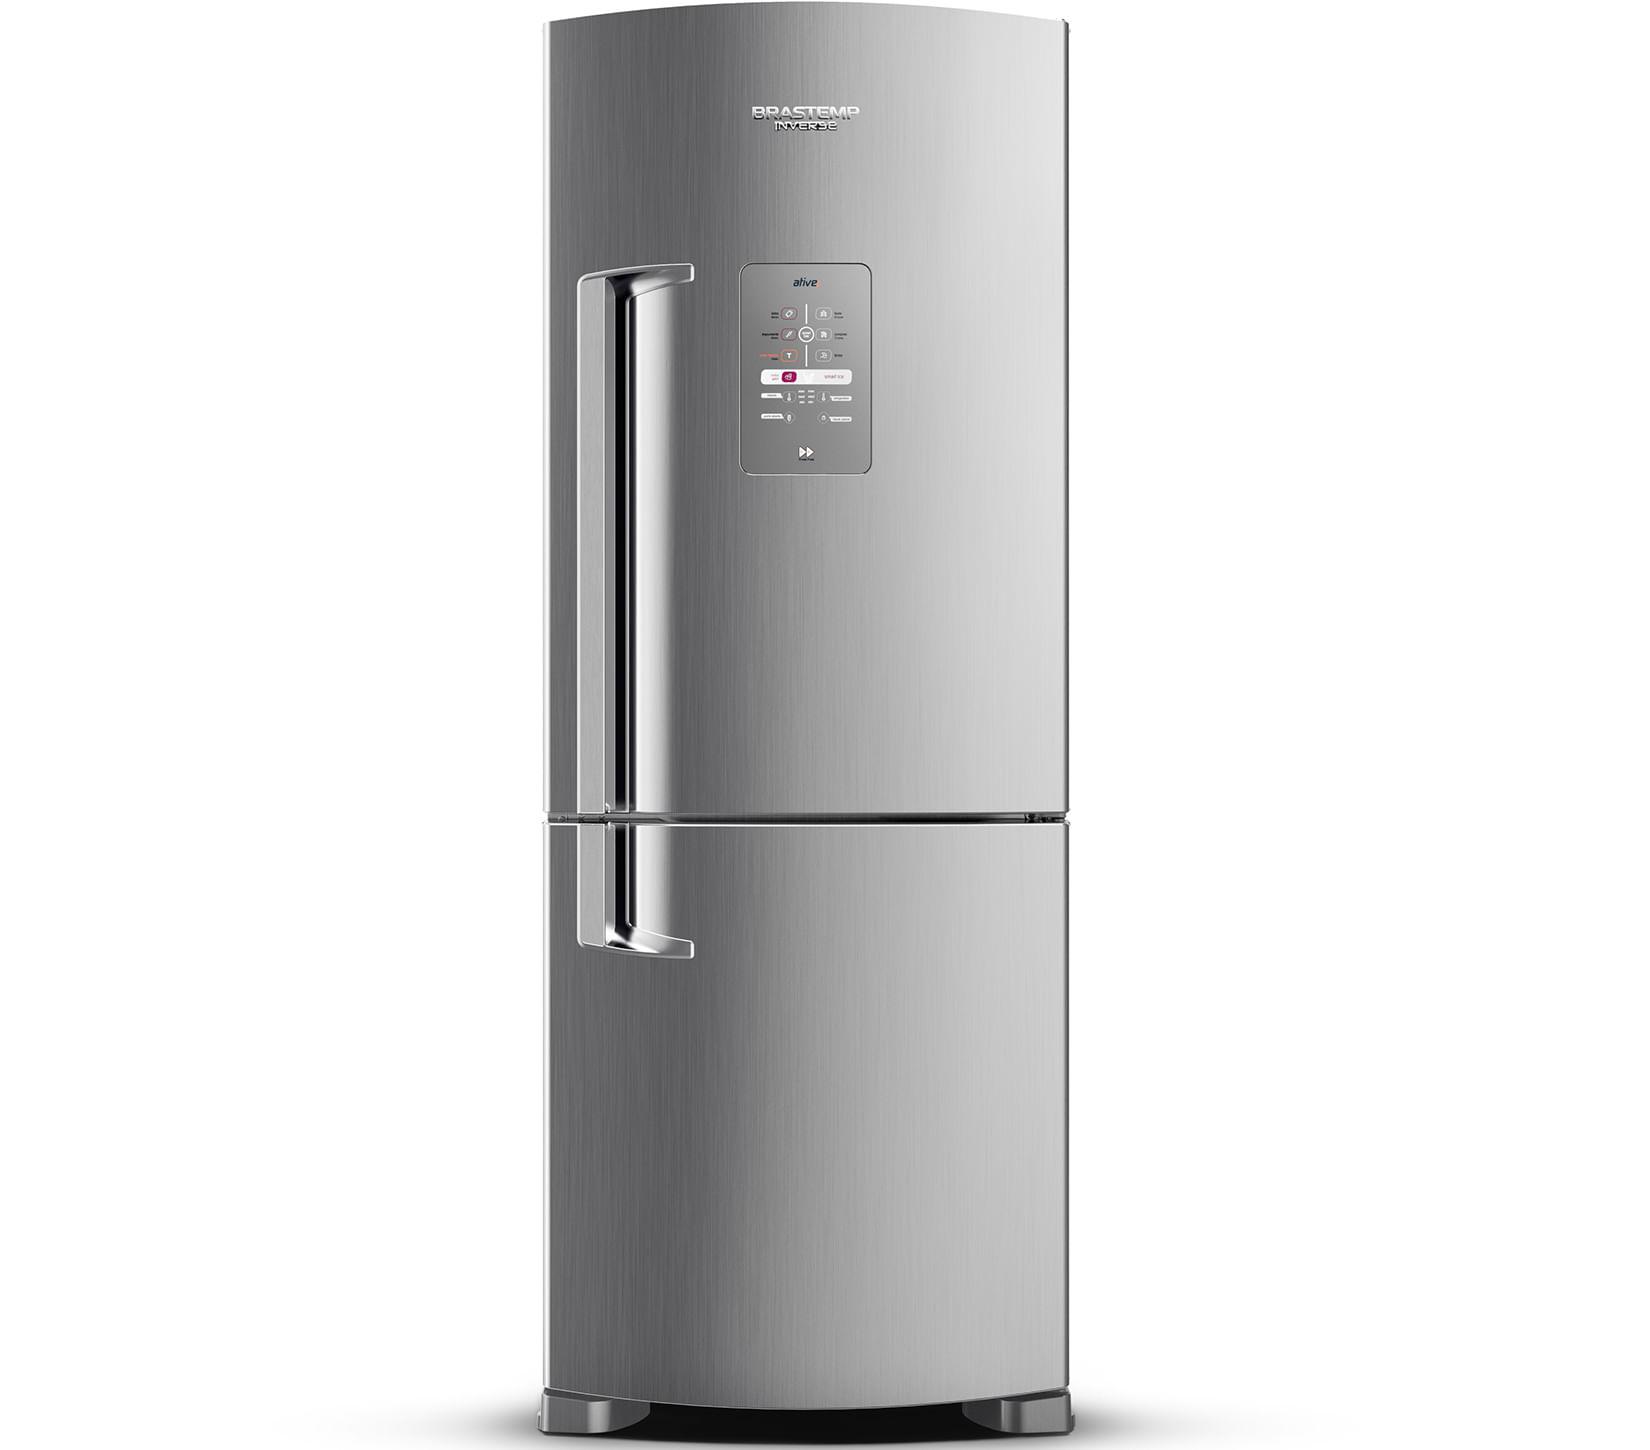 Geladeira Brastemp Frost Free Inverse 422 litros cor Inox com Smart Ice